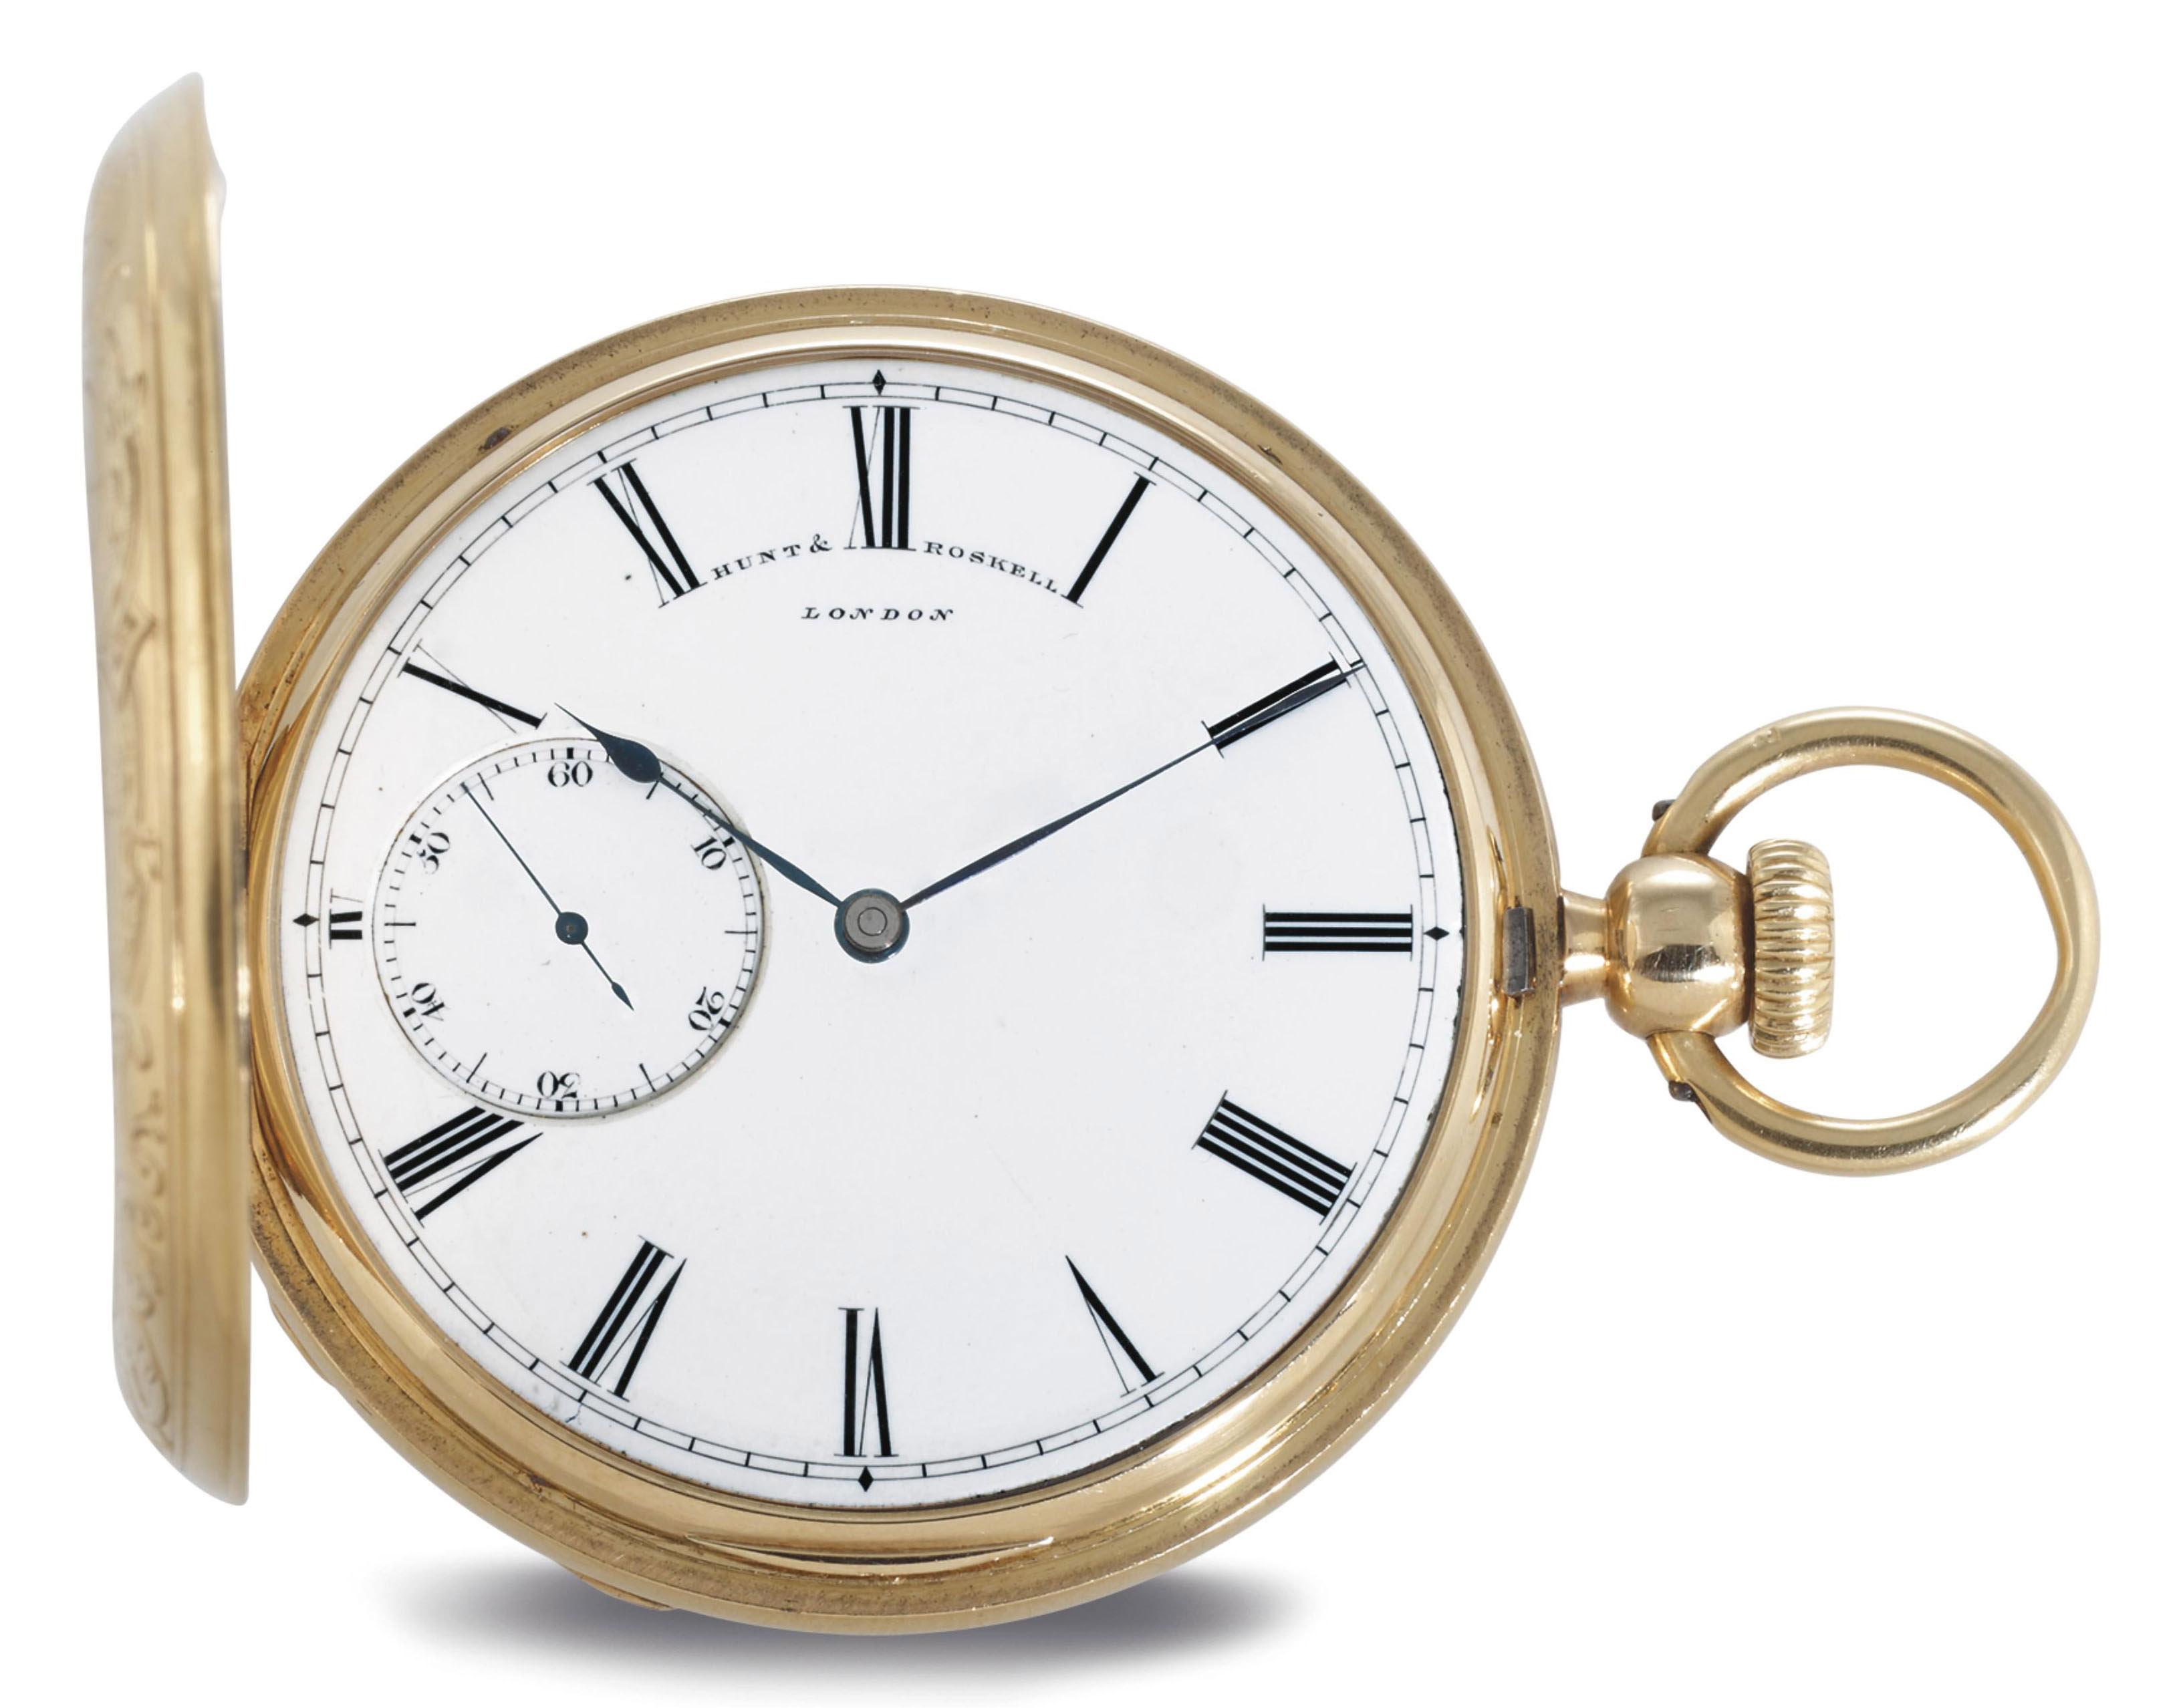 HUNT & ROSKELL. AN 18K GOLD HUNTER CASE DETENT POCKET CHRONOMETER WITH ECCENTRIC SECONDS